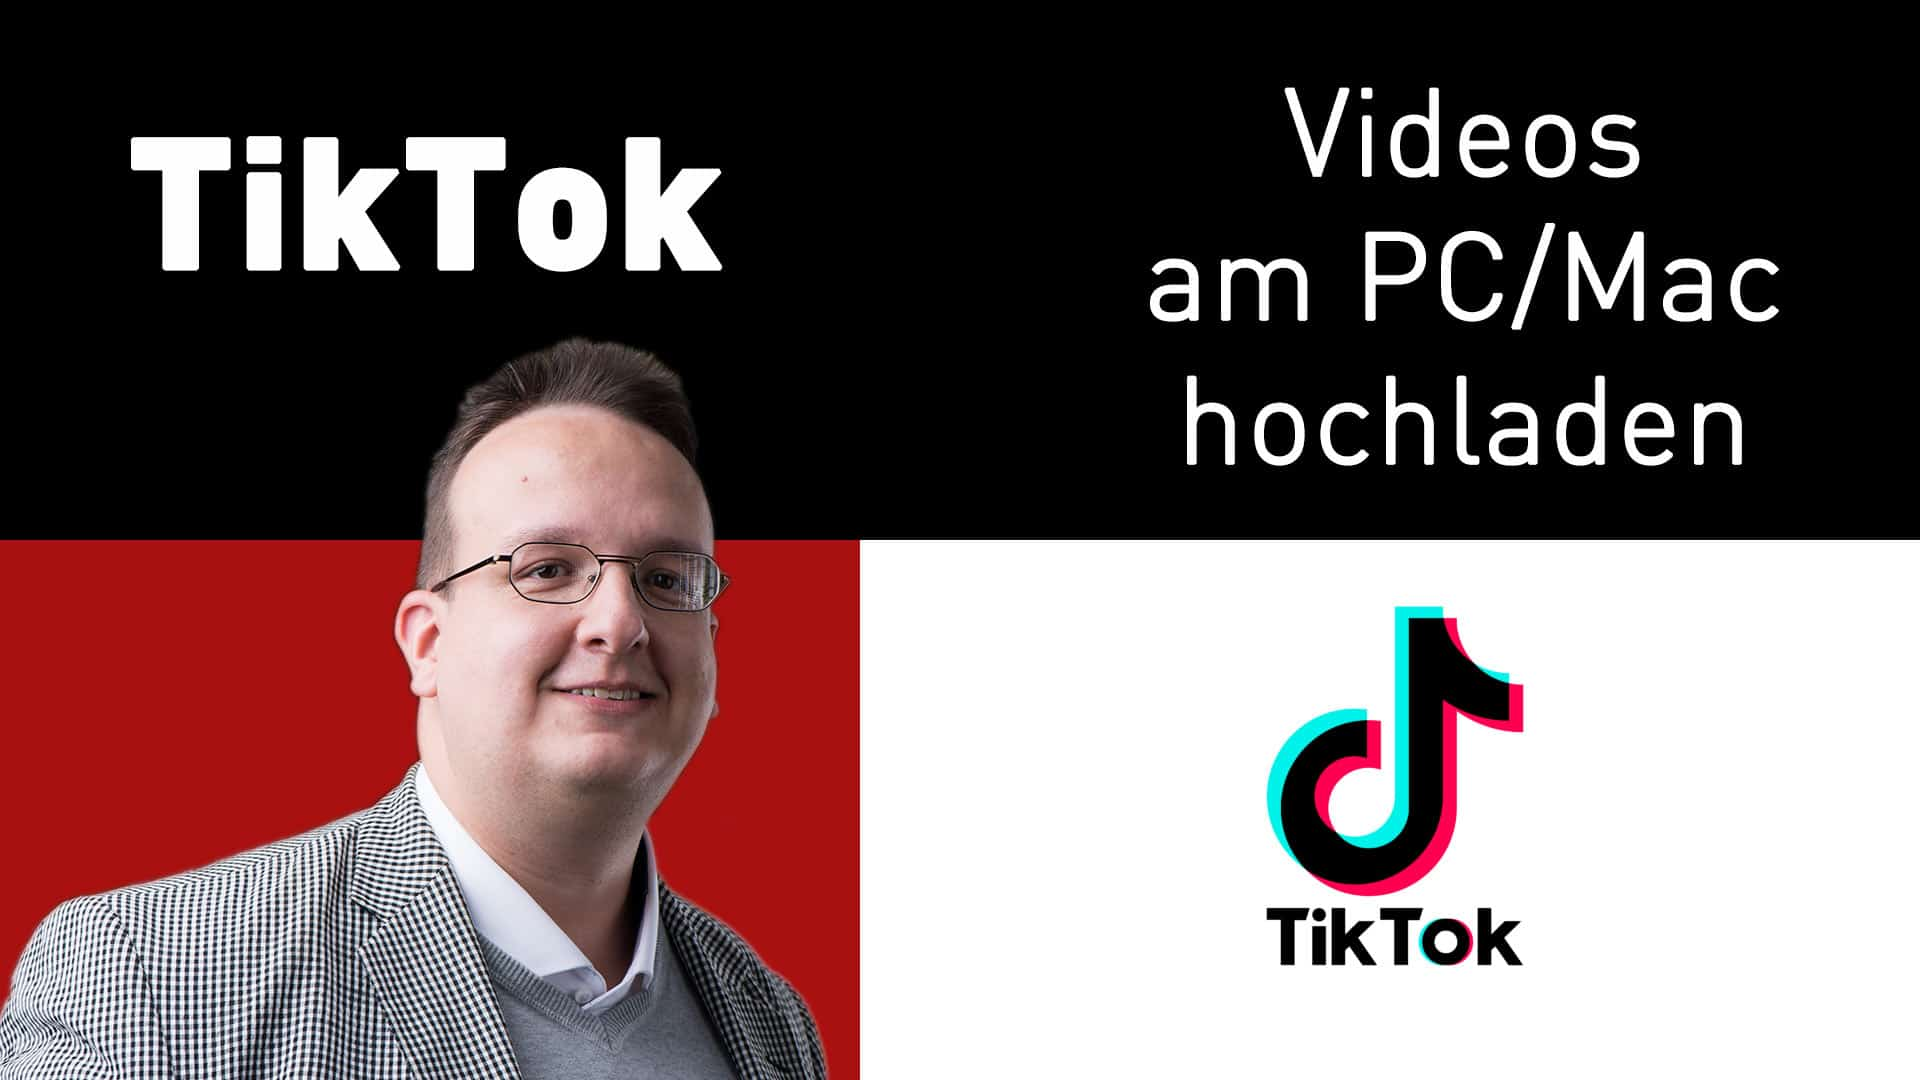 Tiktok Videos am Mac / PC hochladen